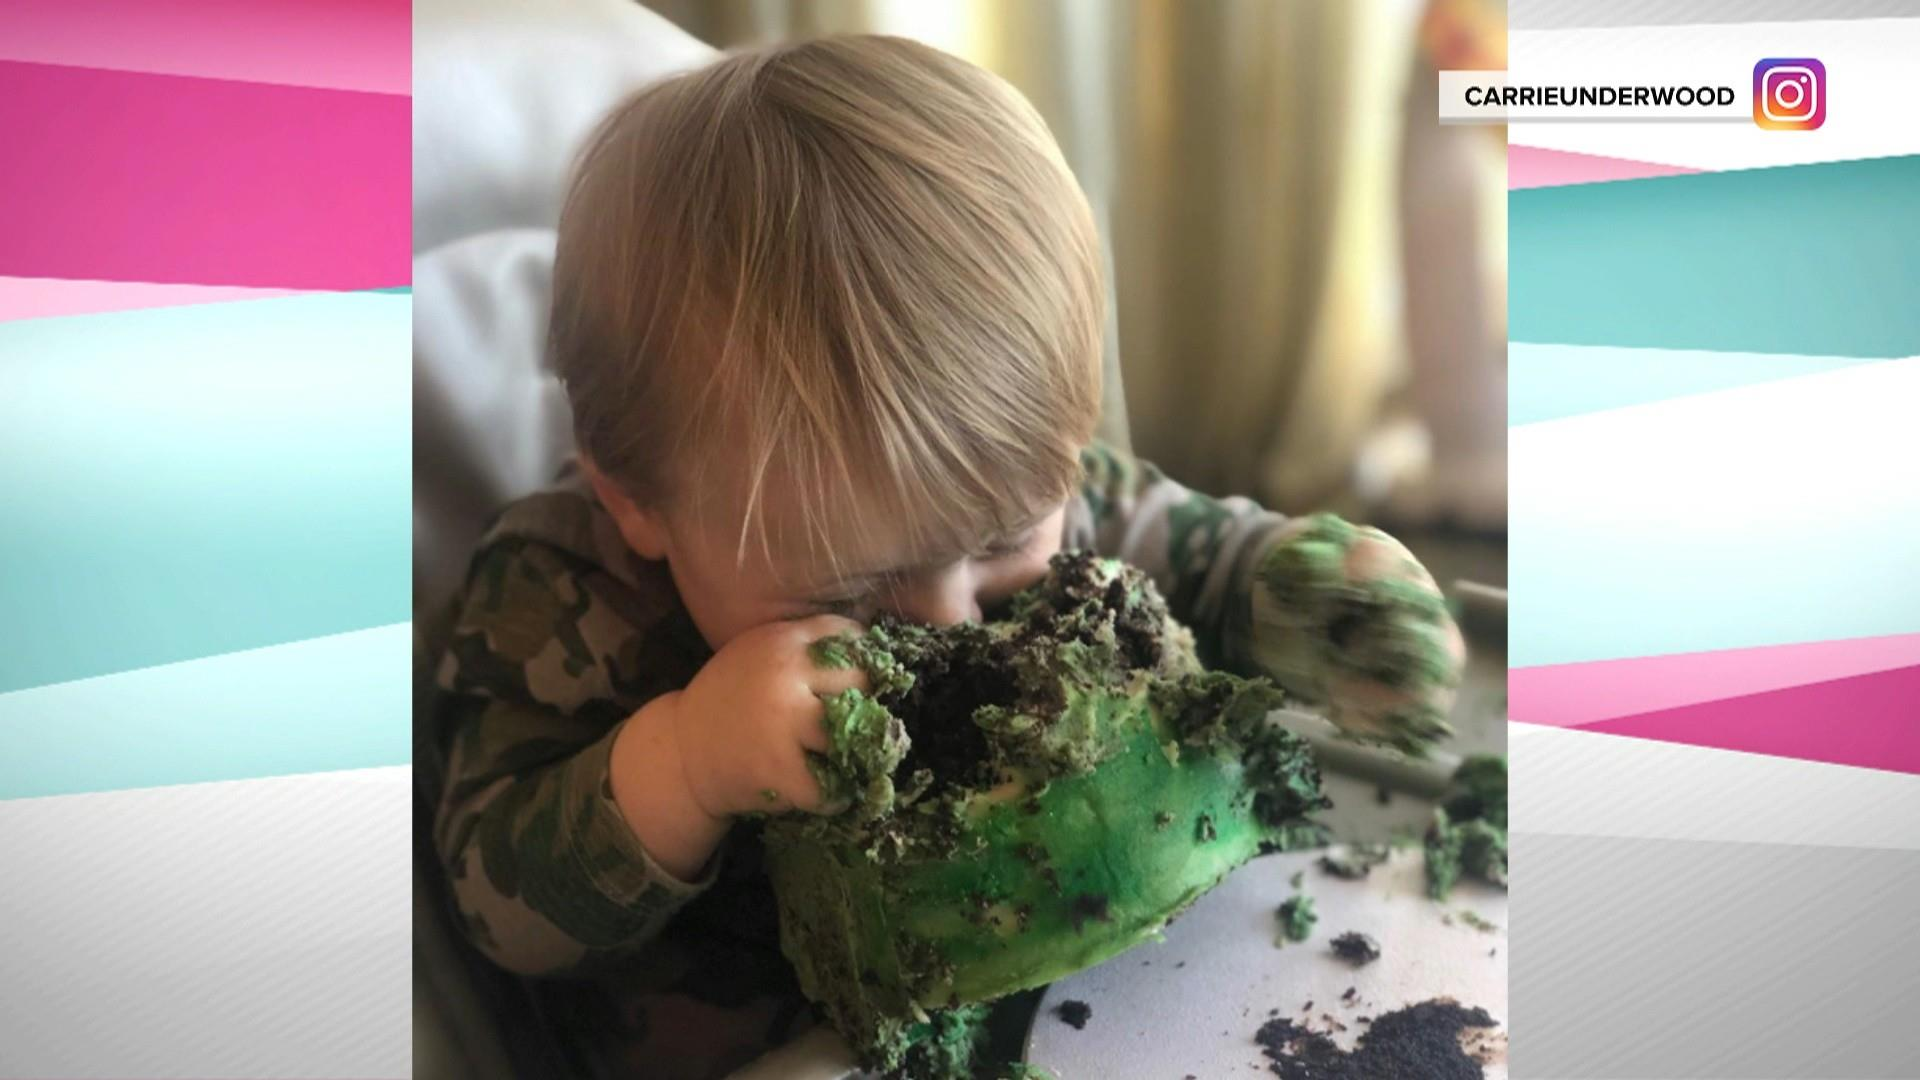 Carrie Underwood celebrates 'miracle baby' Jacob's 1st birthday